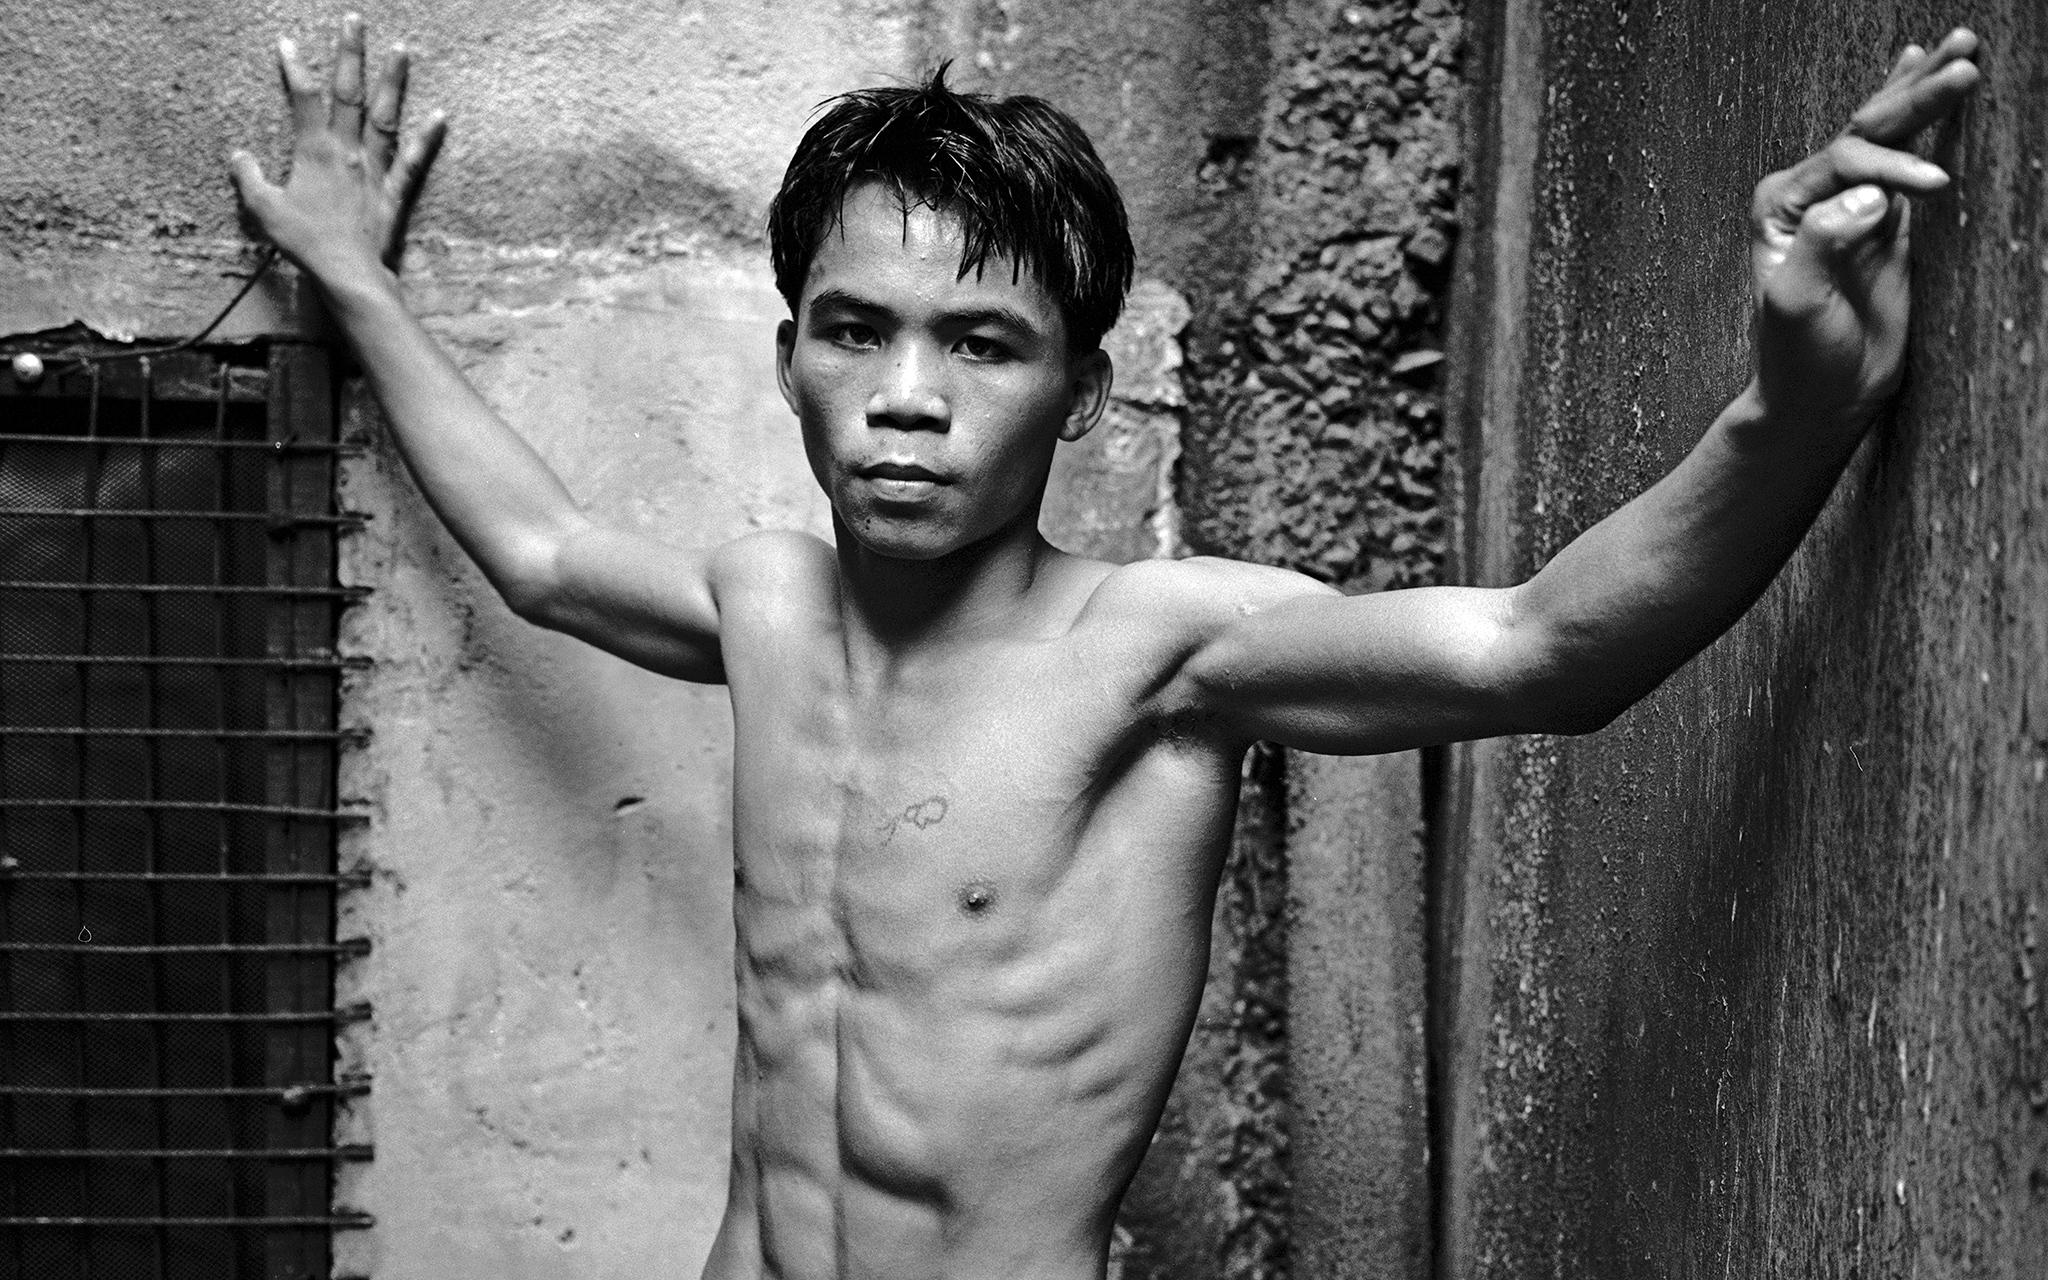 Manny 1996